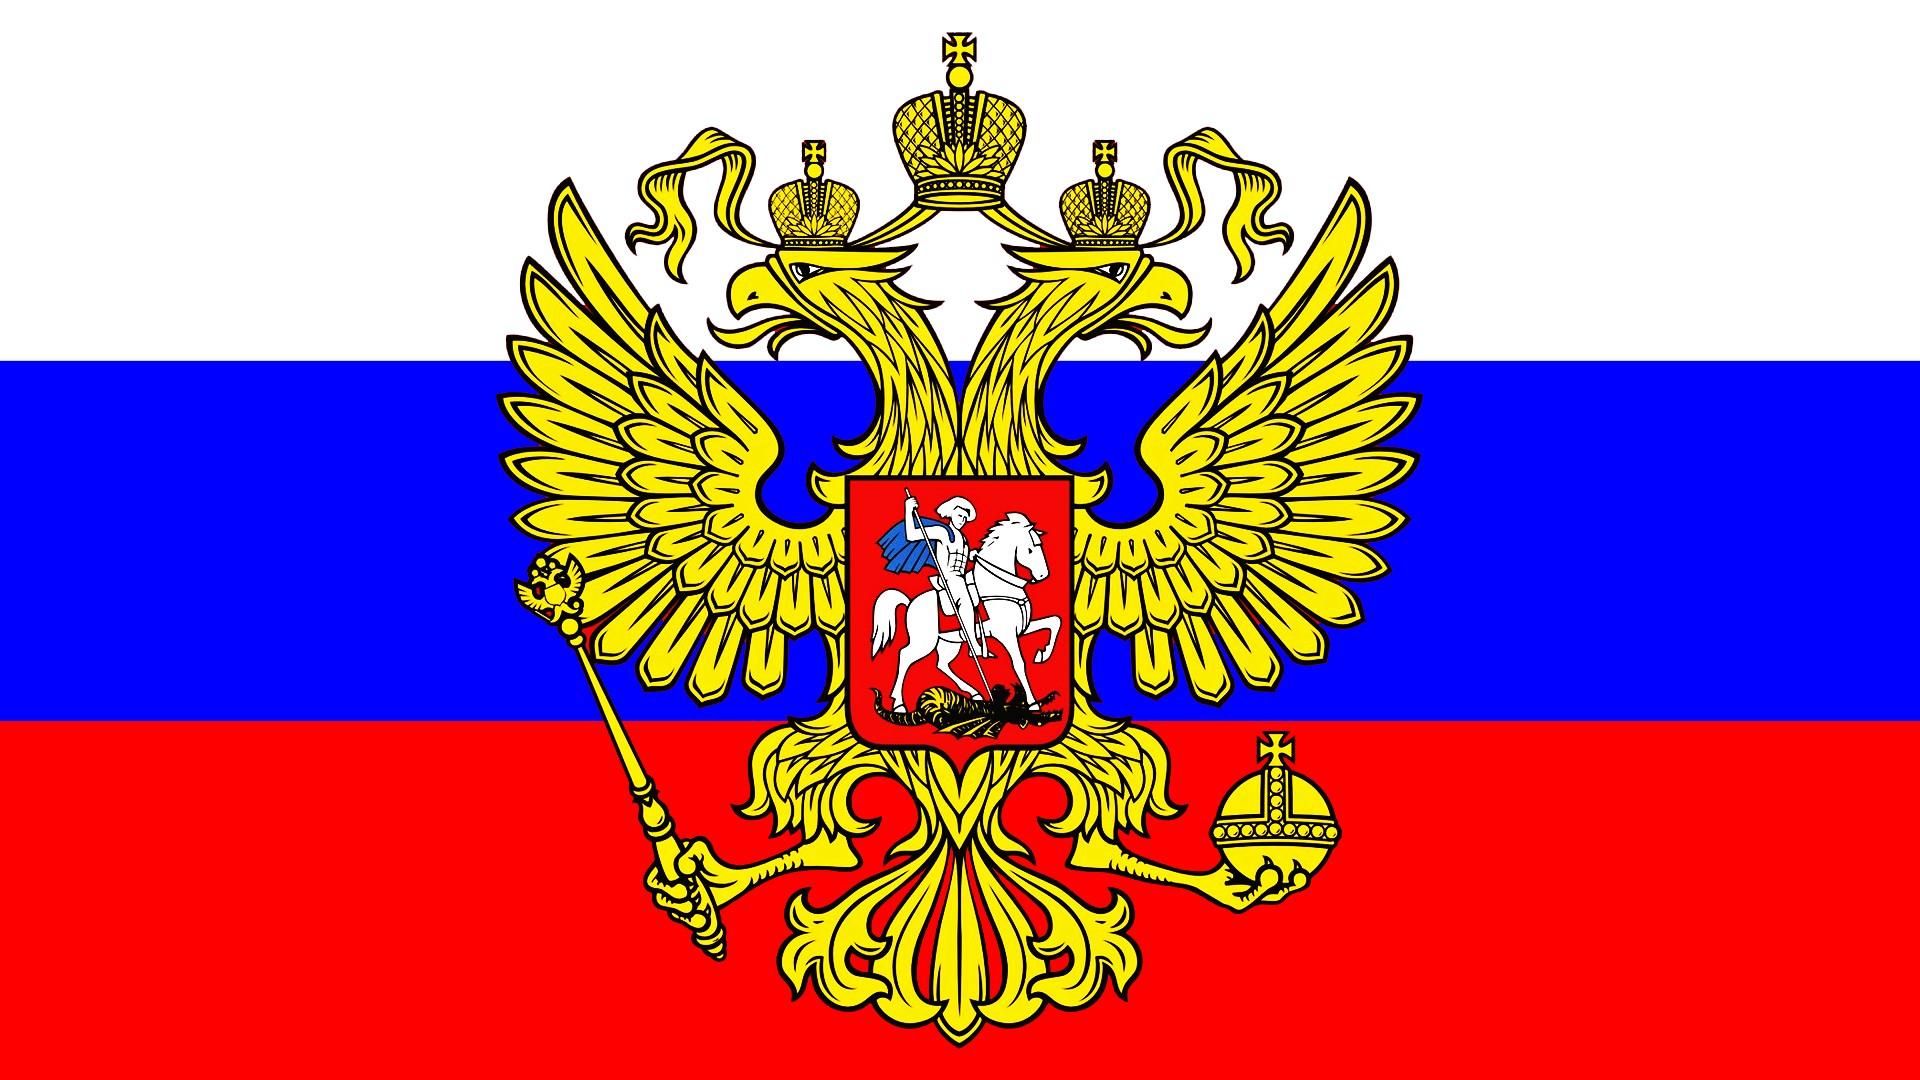 Новогоднее обращение президента РФ В.В.Путина (РТР, 31.12.2000)